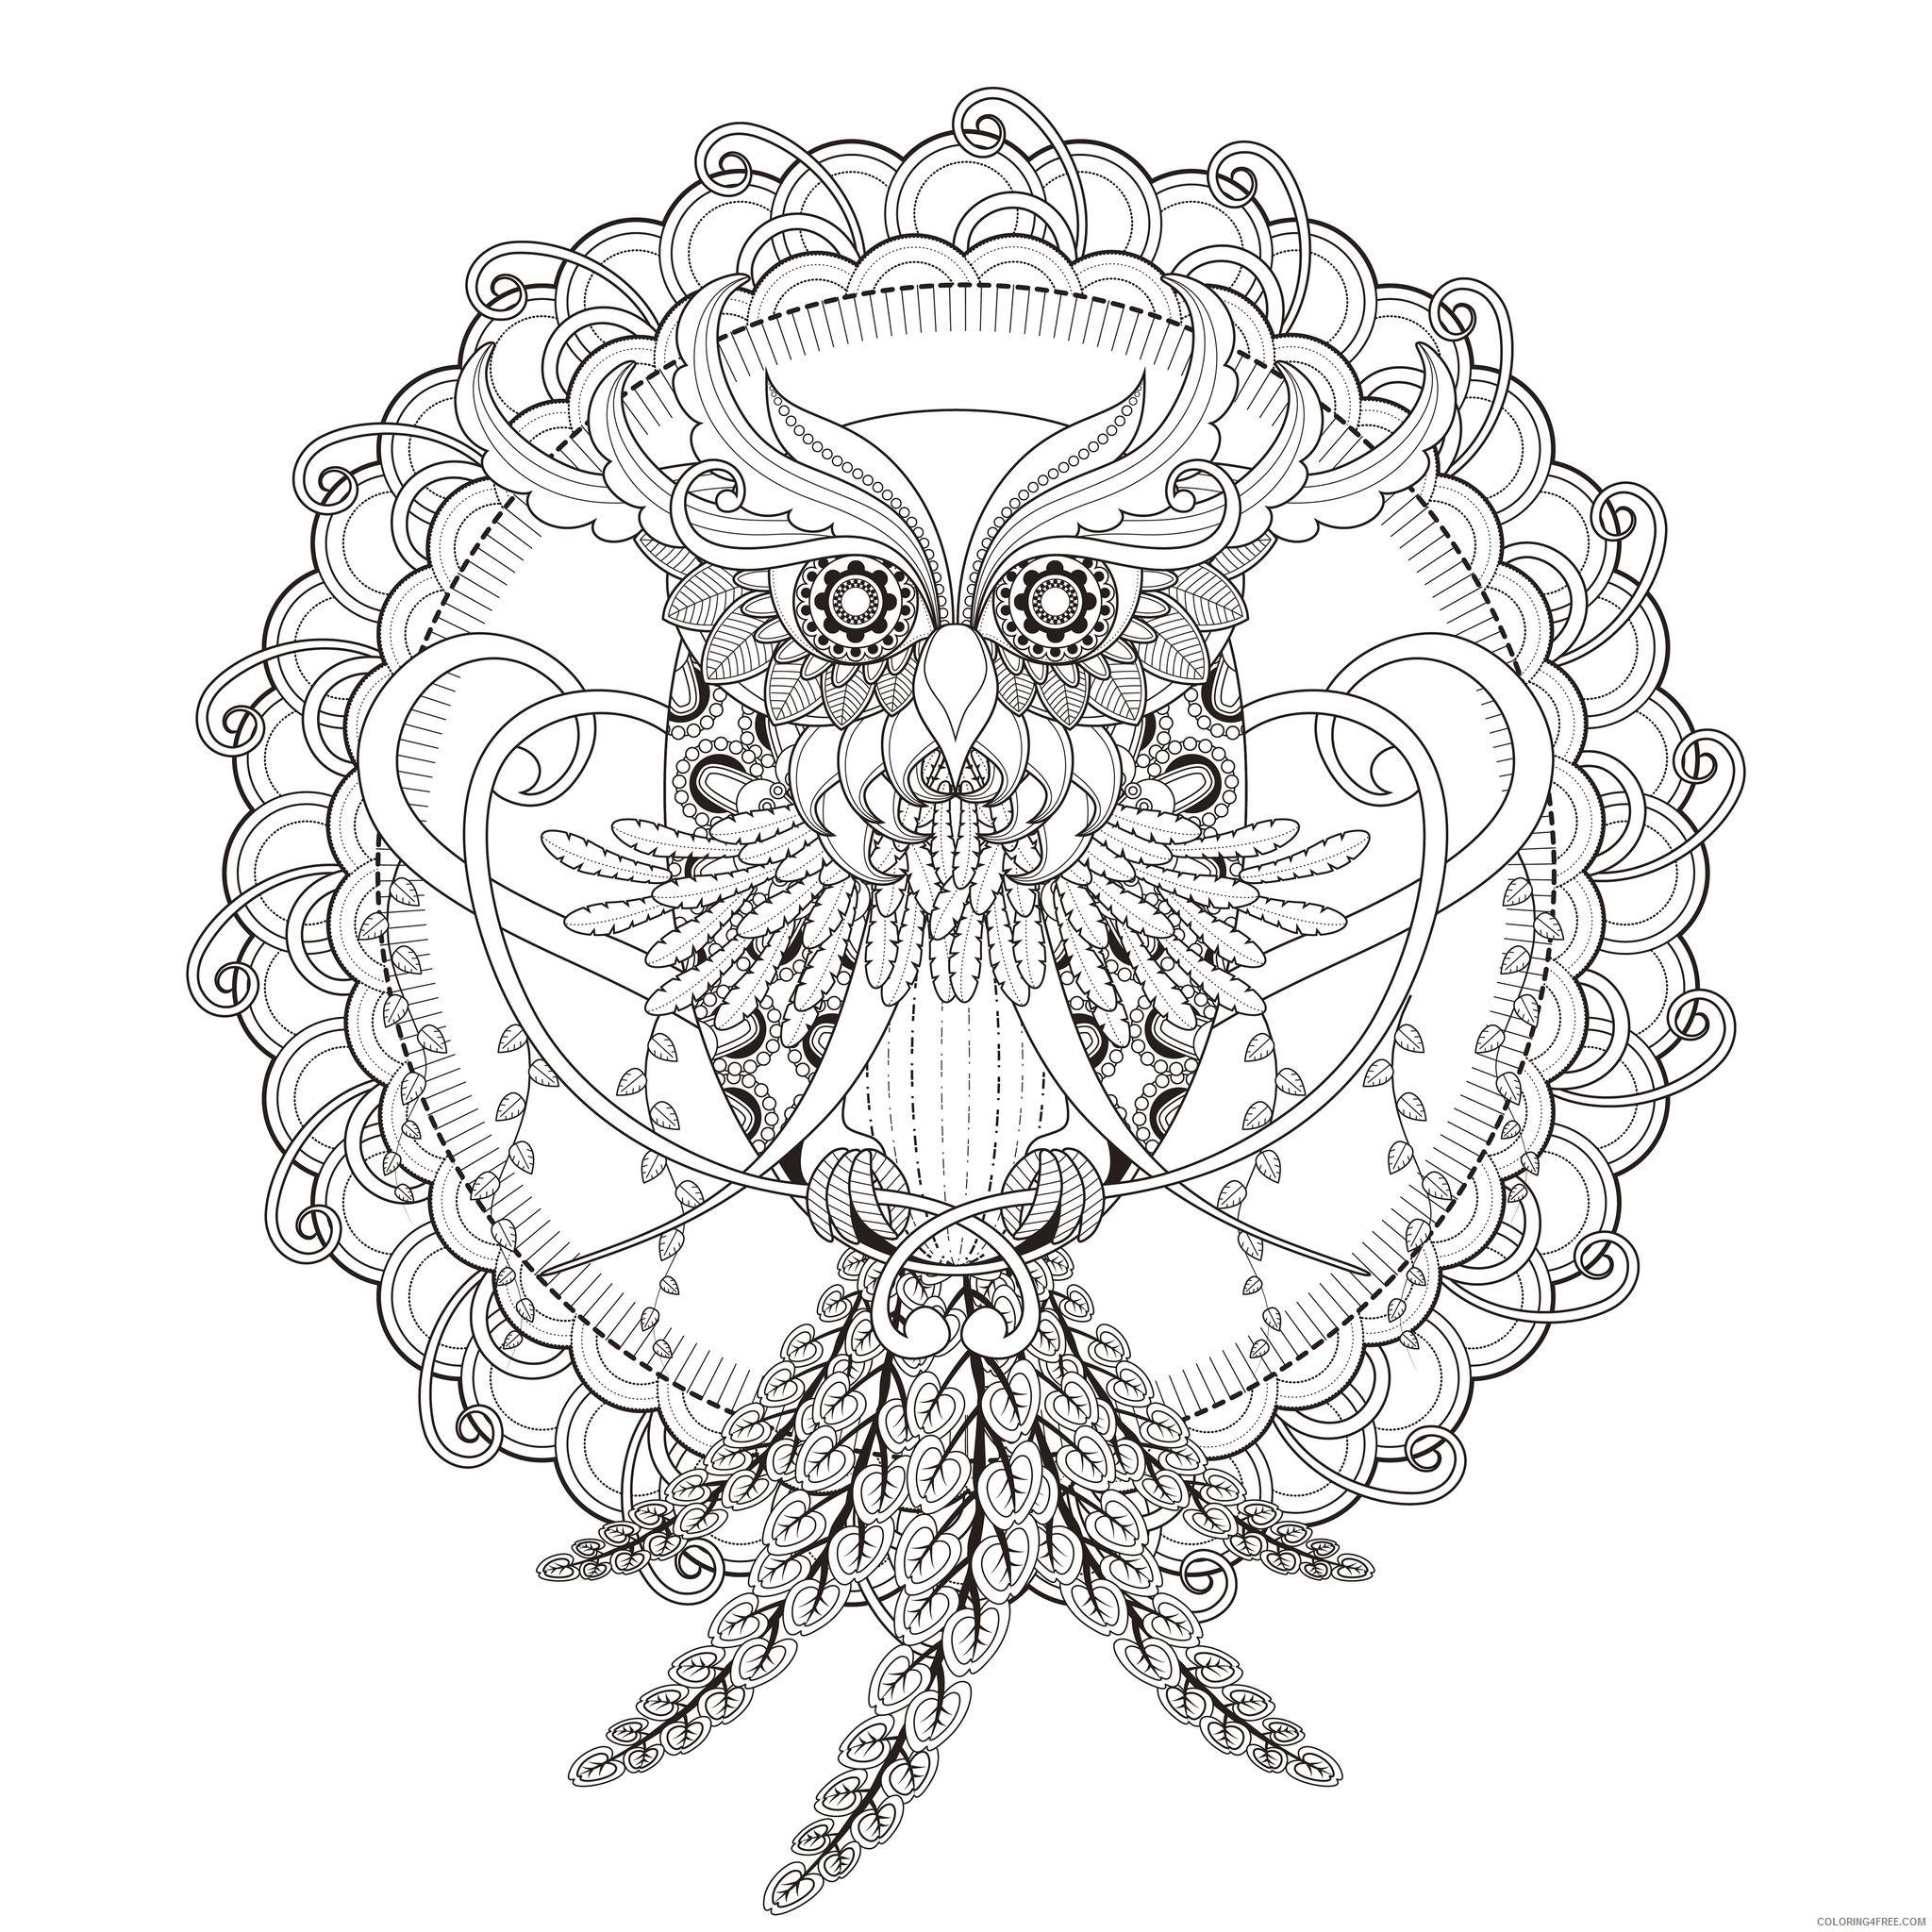 mandala coloring pages owl by kchung Coloring4free